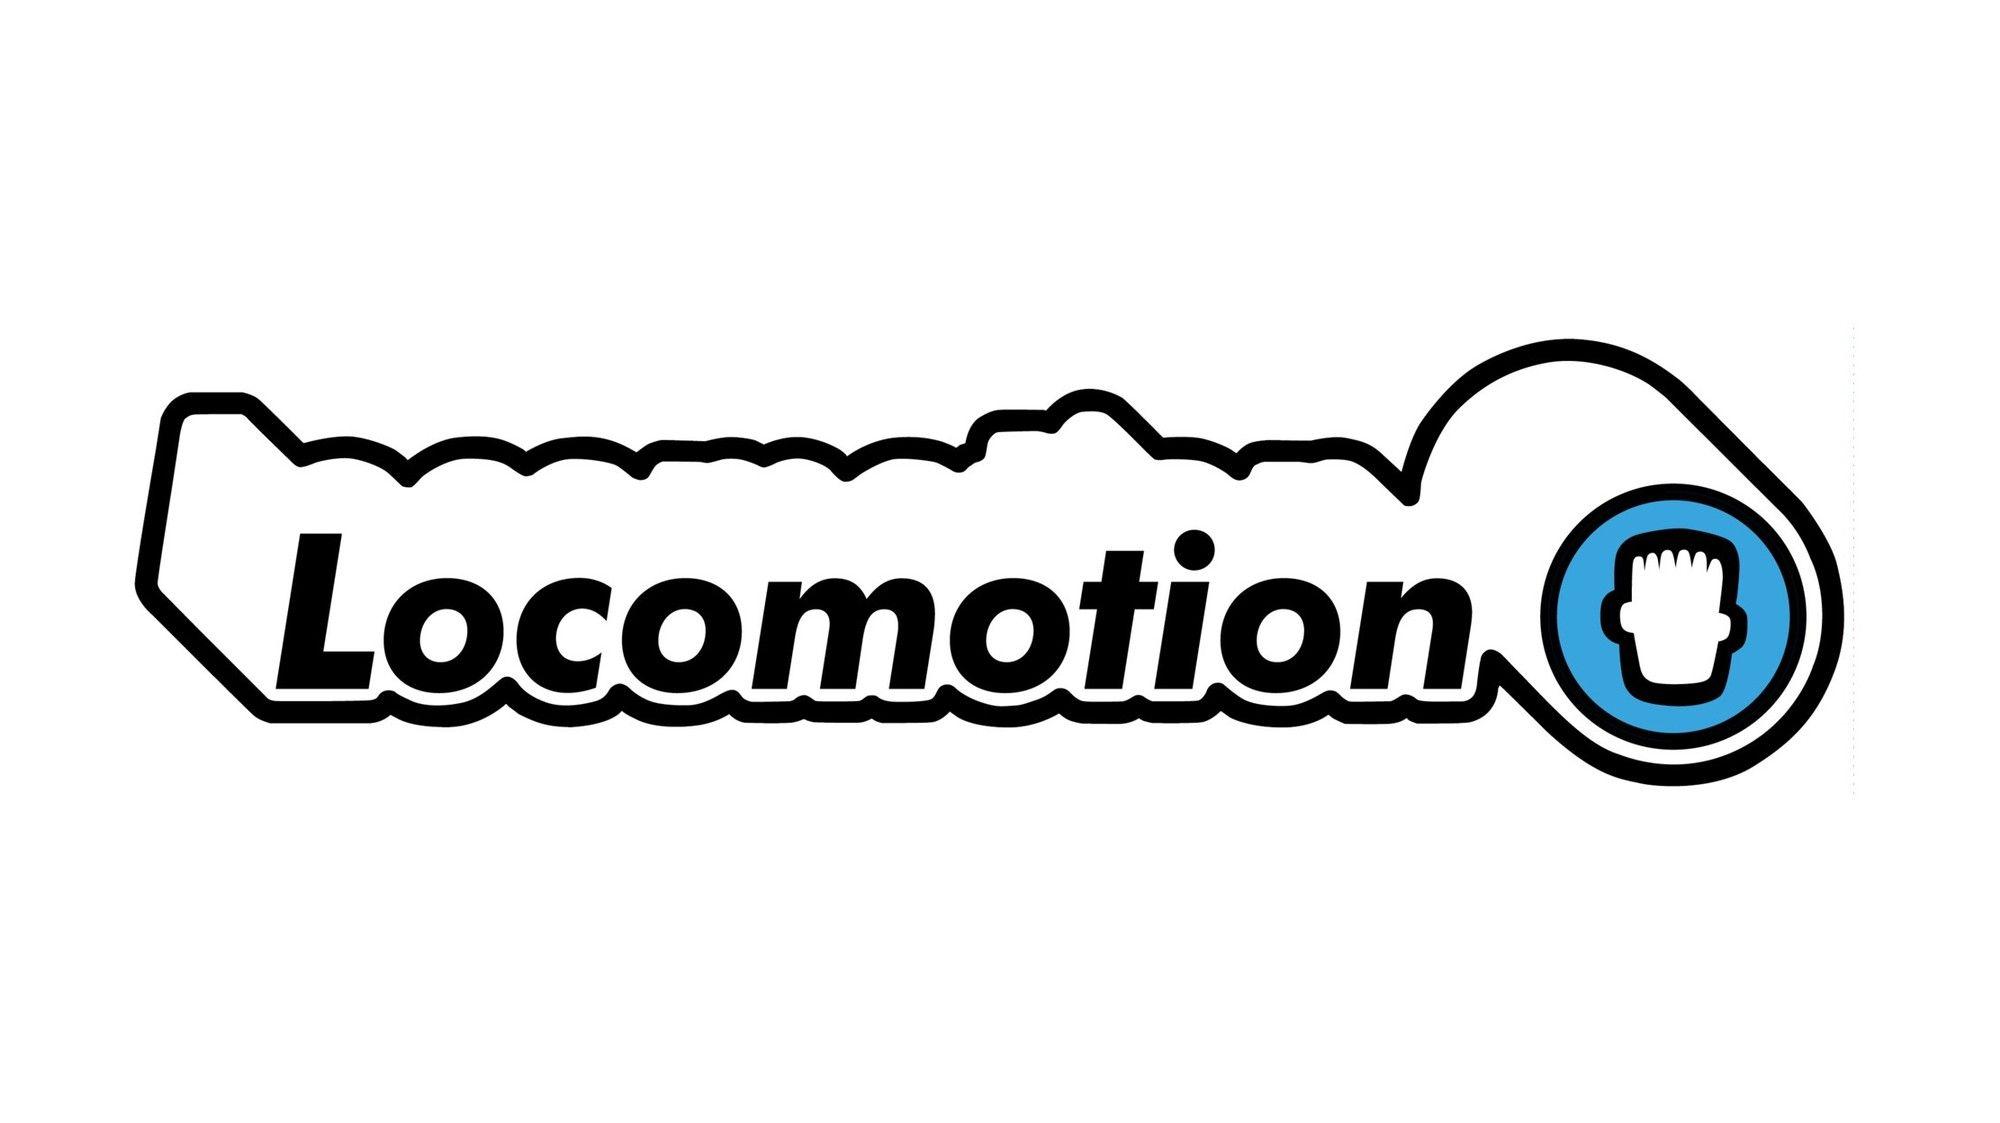 Locomotion TV